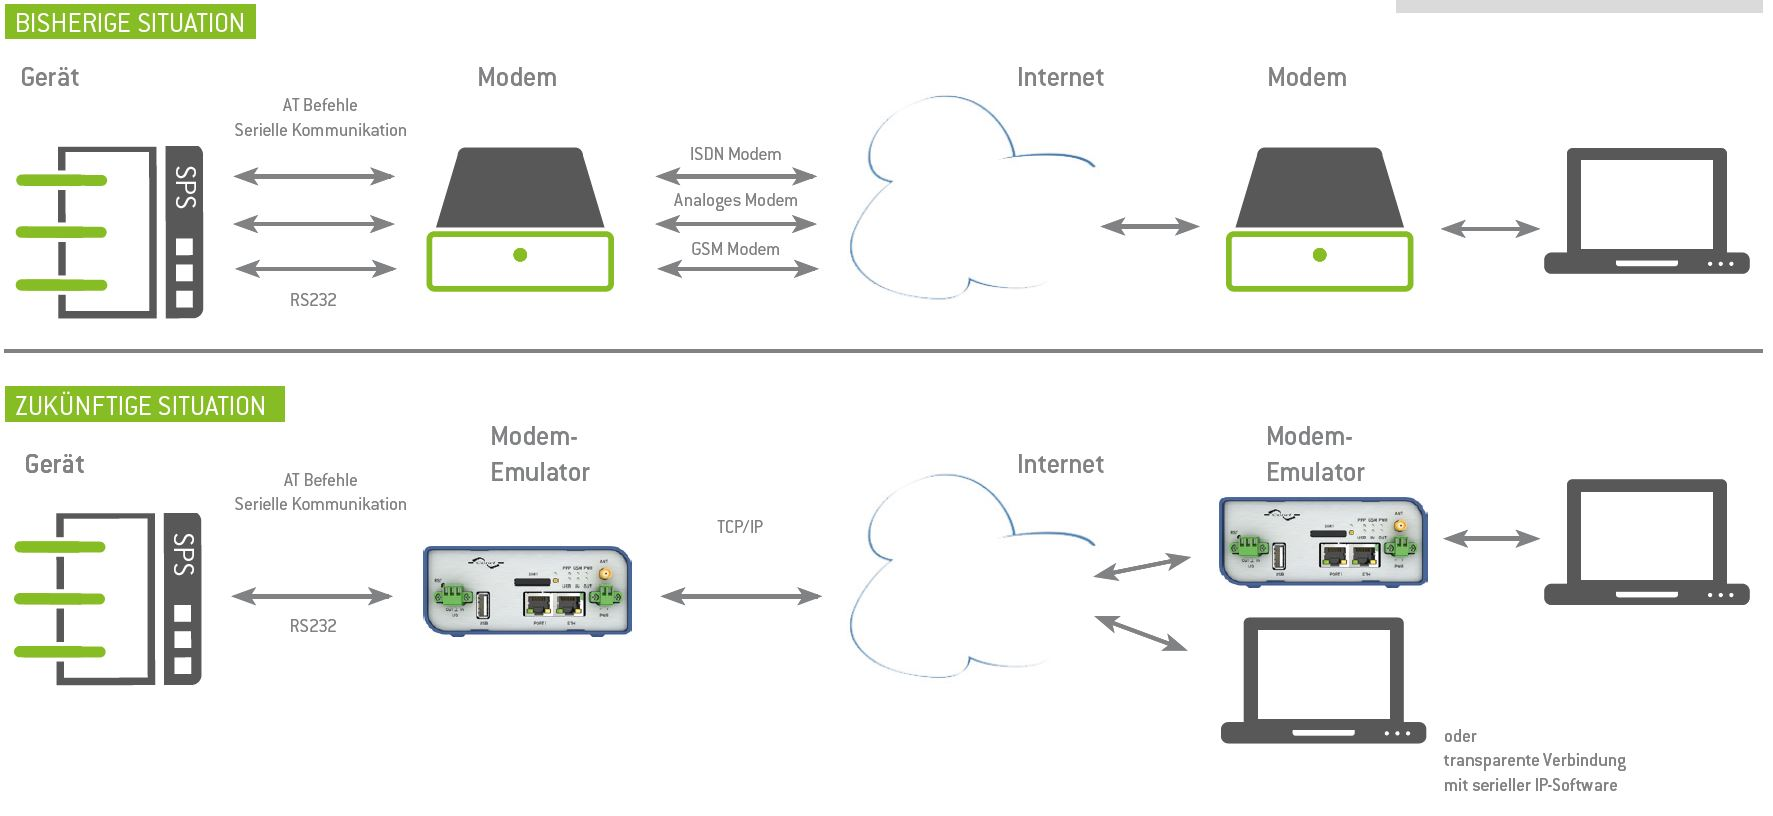 bme-b-b-smartworx-conel-modem-emulator-diagramm